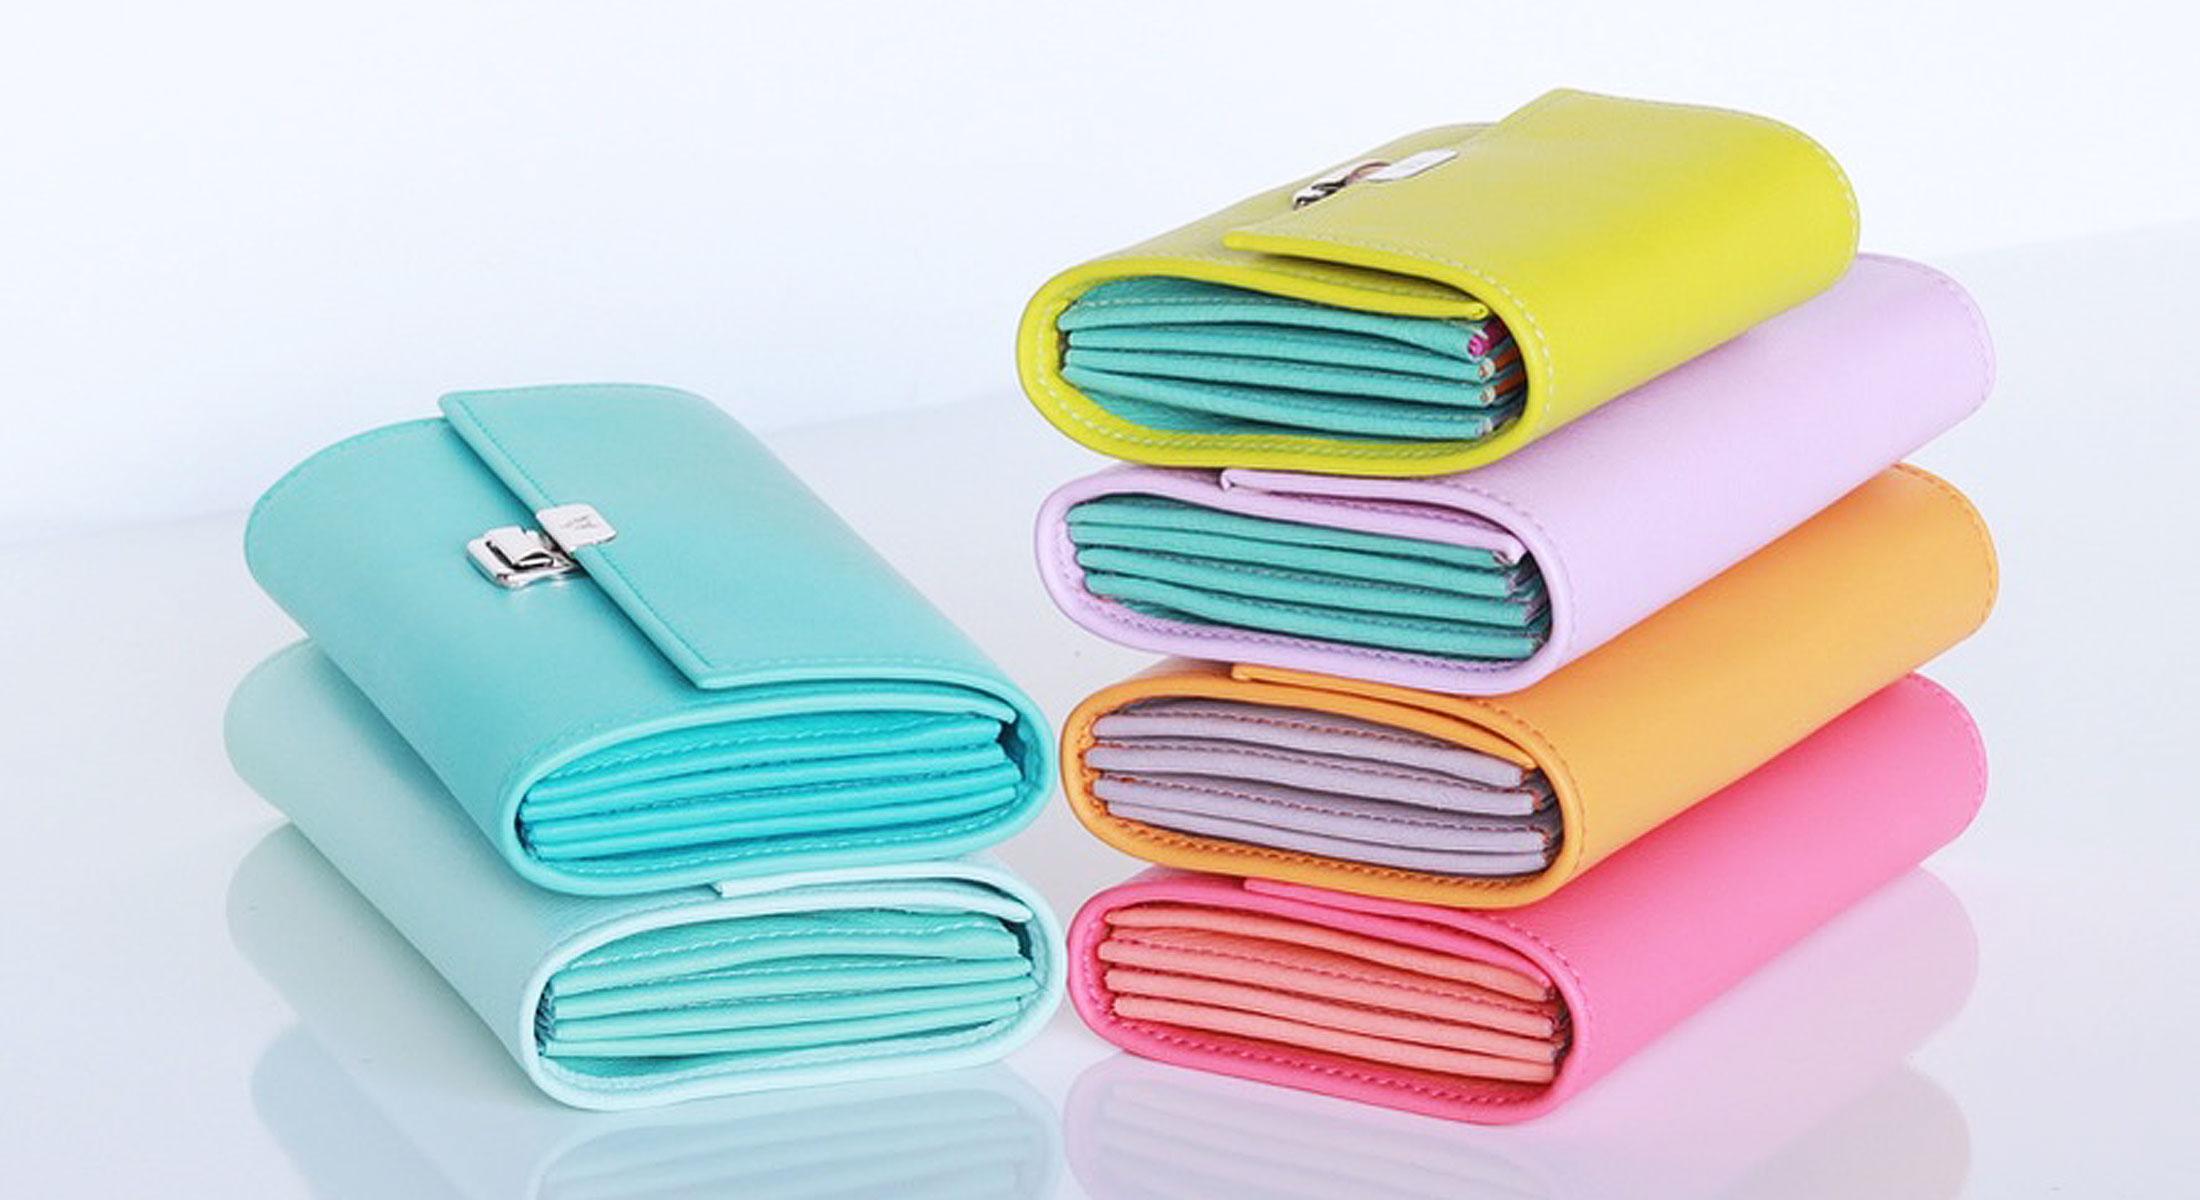 elfenklang öeder portemonnaies pastellfarben kaufen